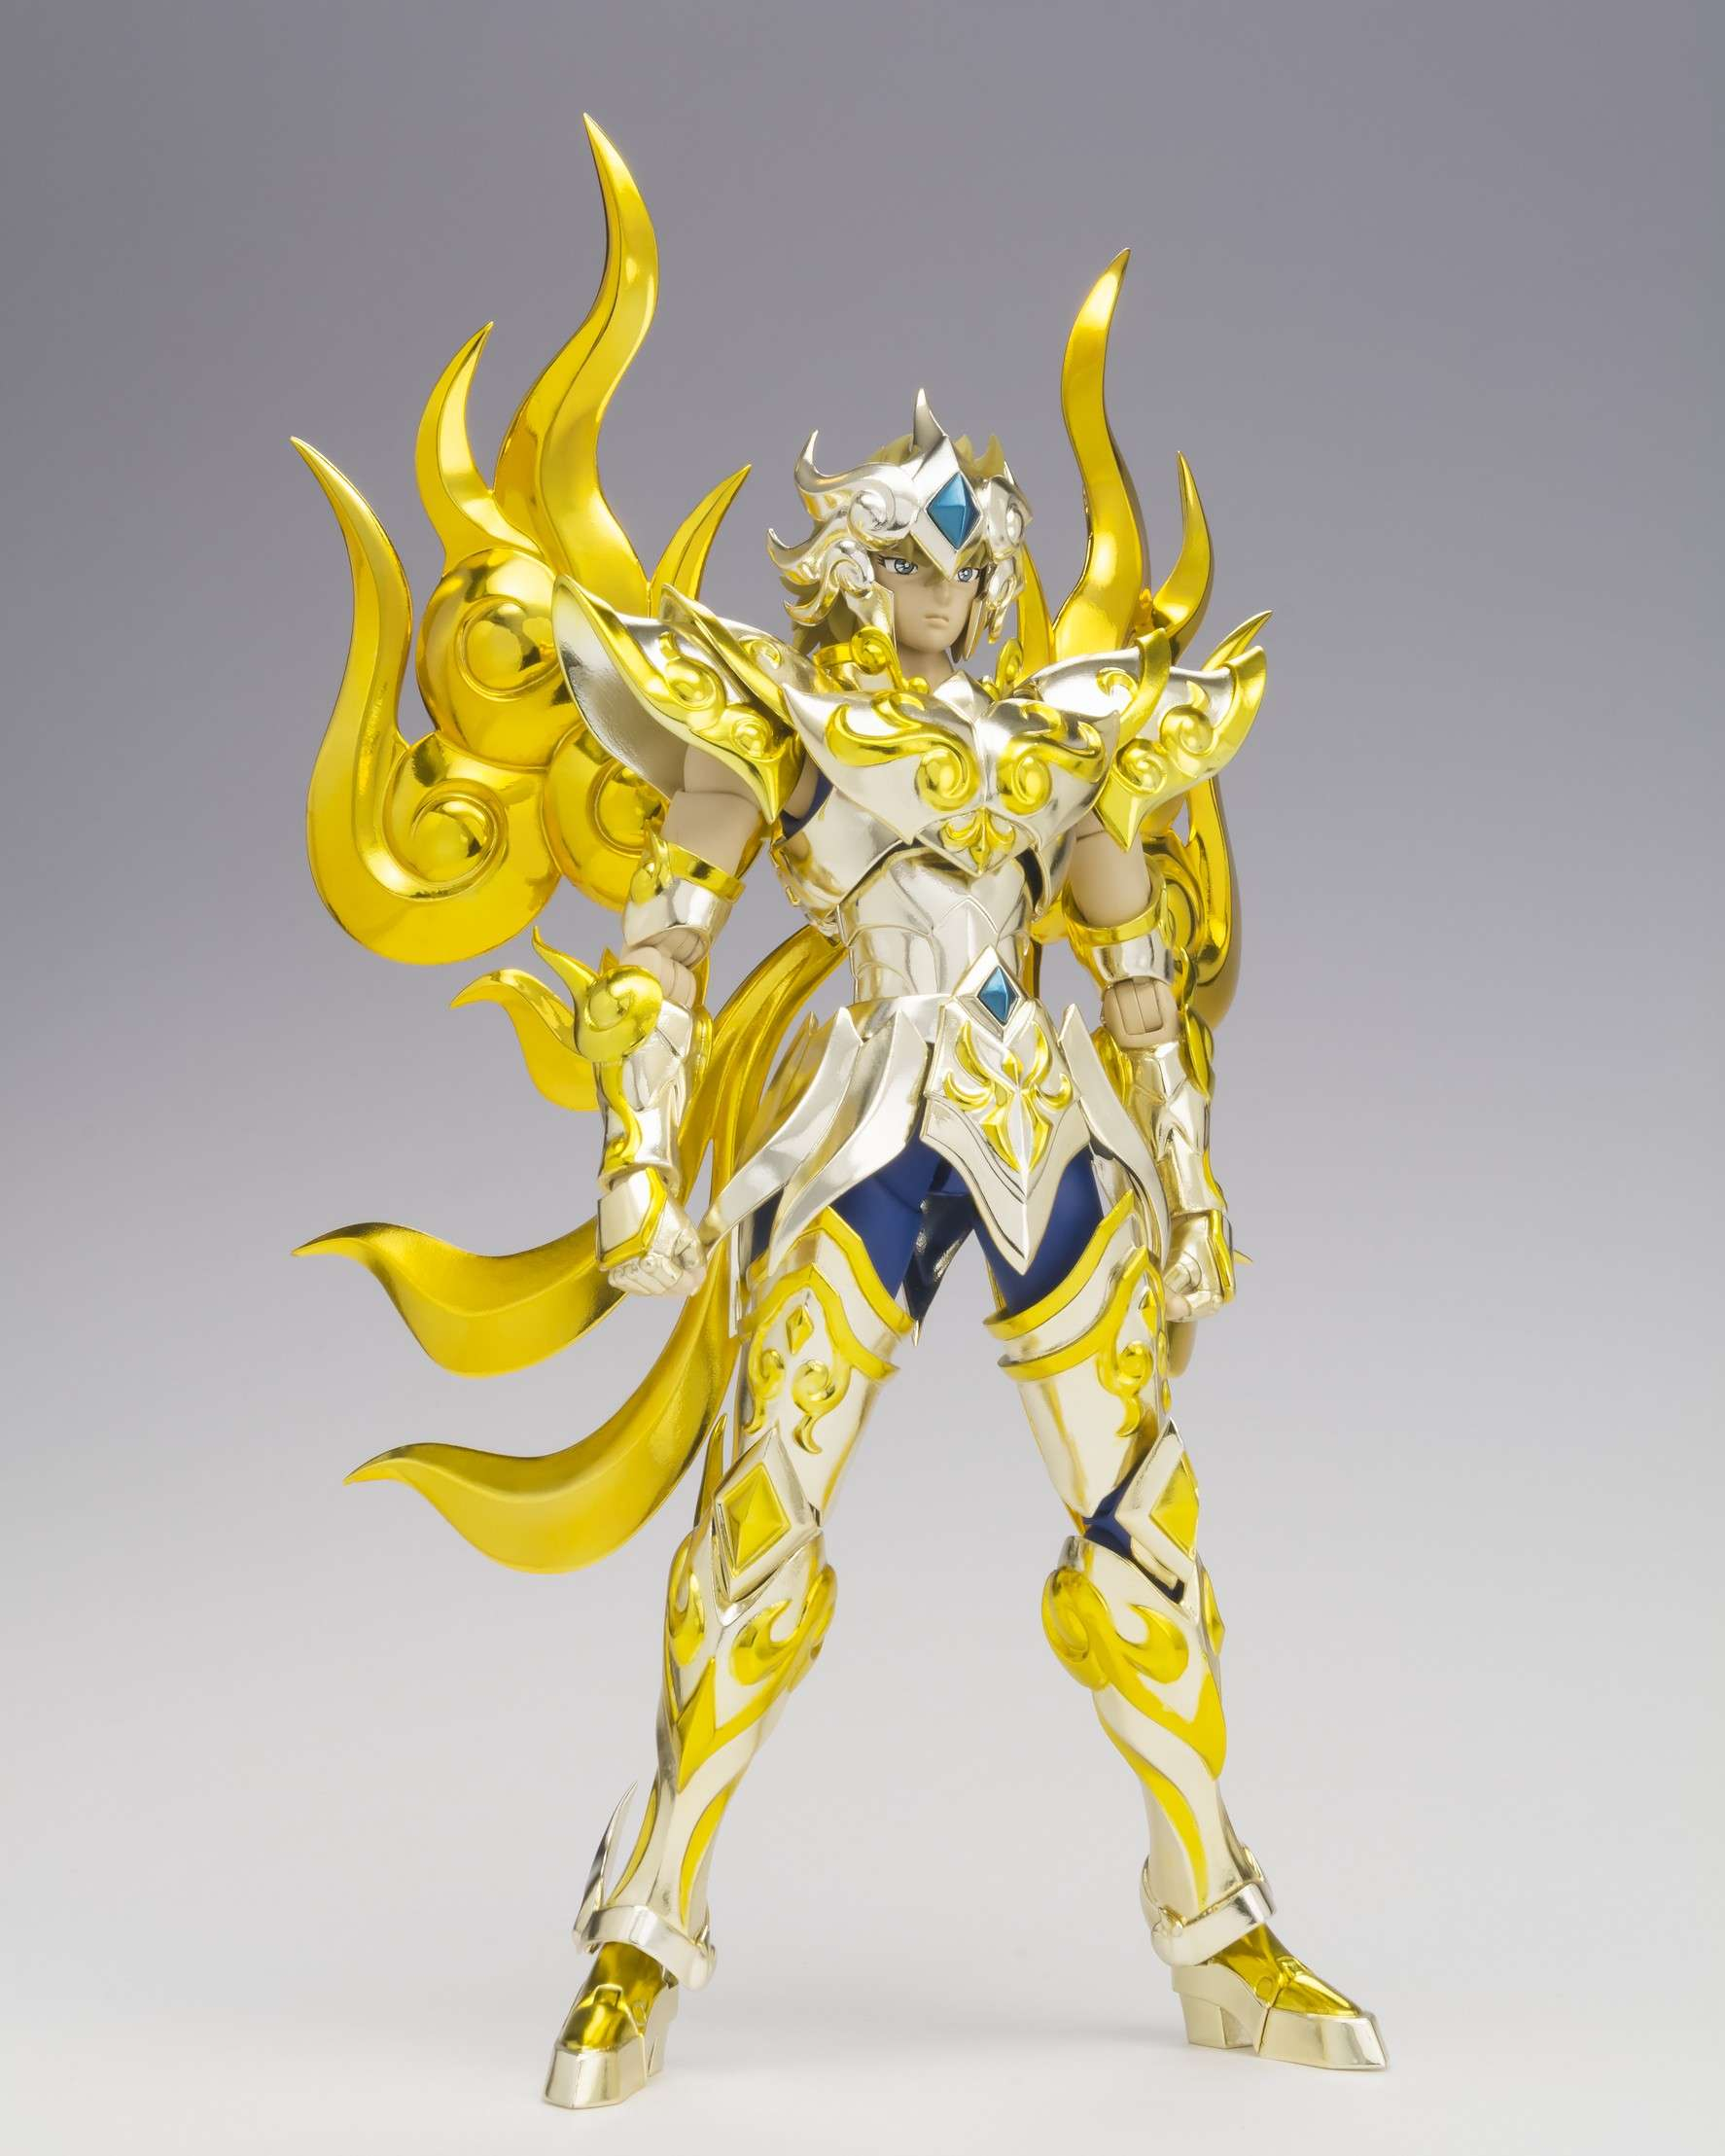 [Myth Cloth EX] Soul of Gold - Leo Aiolia gold Cloth Ro_0110